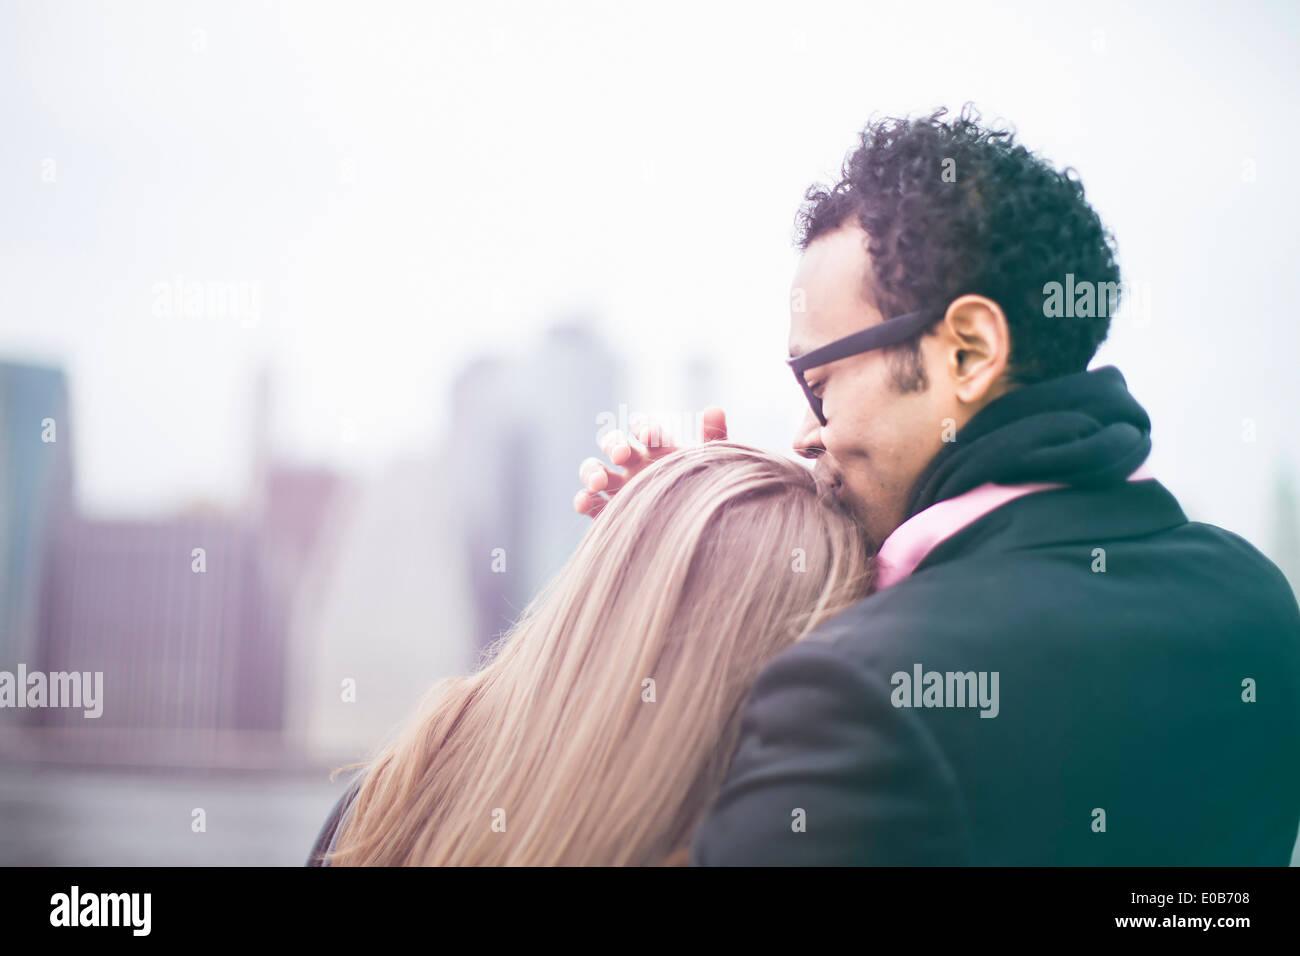 Affectionate young couple and Manhattan skyline, New York, USA - Stock Image